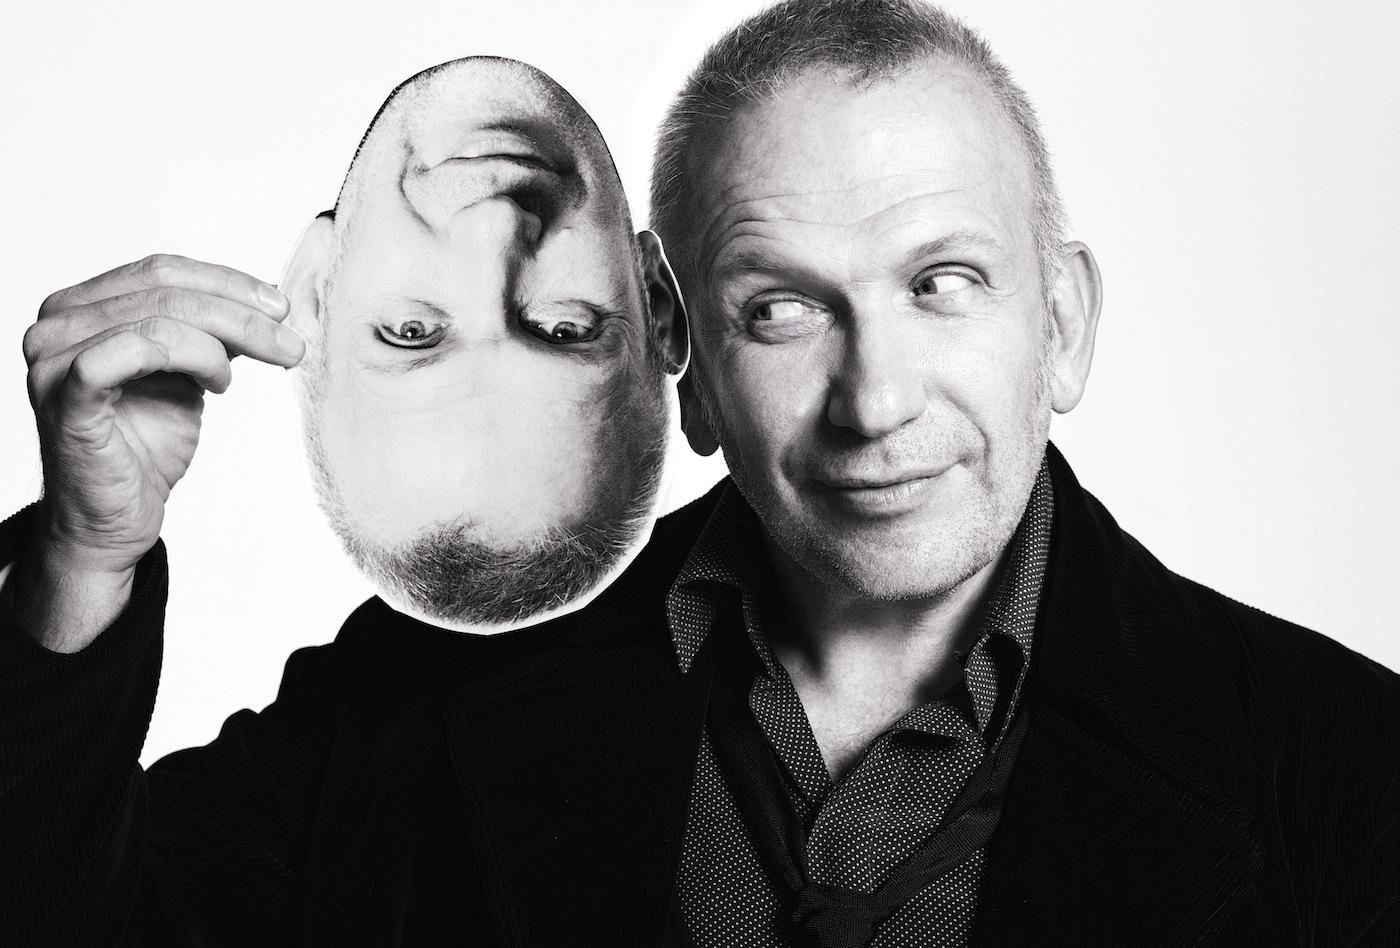 Jean Paul Gaultier 关闭严重亏损的成衣业务